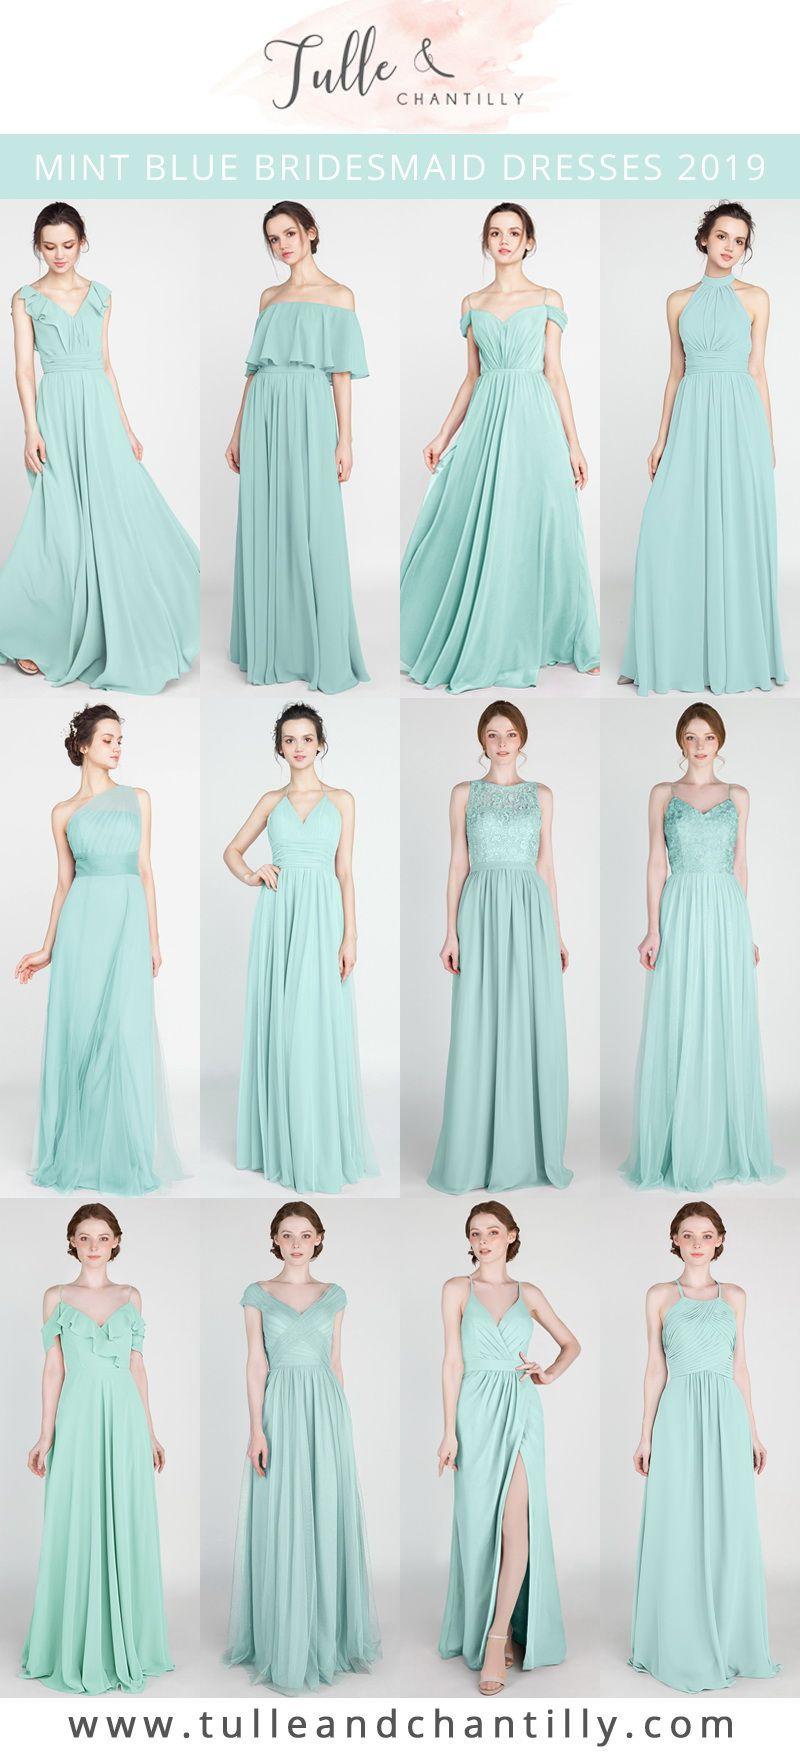 Long Short Bridesmaid Dresses 79 149 Size 0 30 And 50 Colors Mint Bridesmaid Dresses Summer Bridesmaid Dresses Mint Bridesmaid Dresses Long [ 1755 x 800 Pixel ]